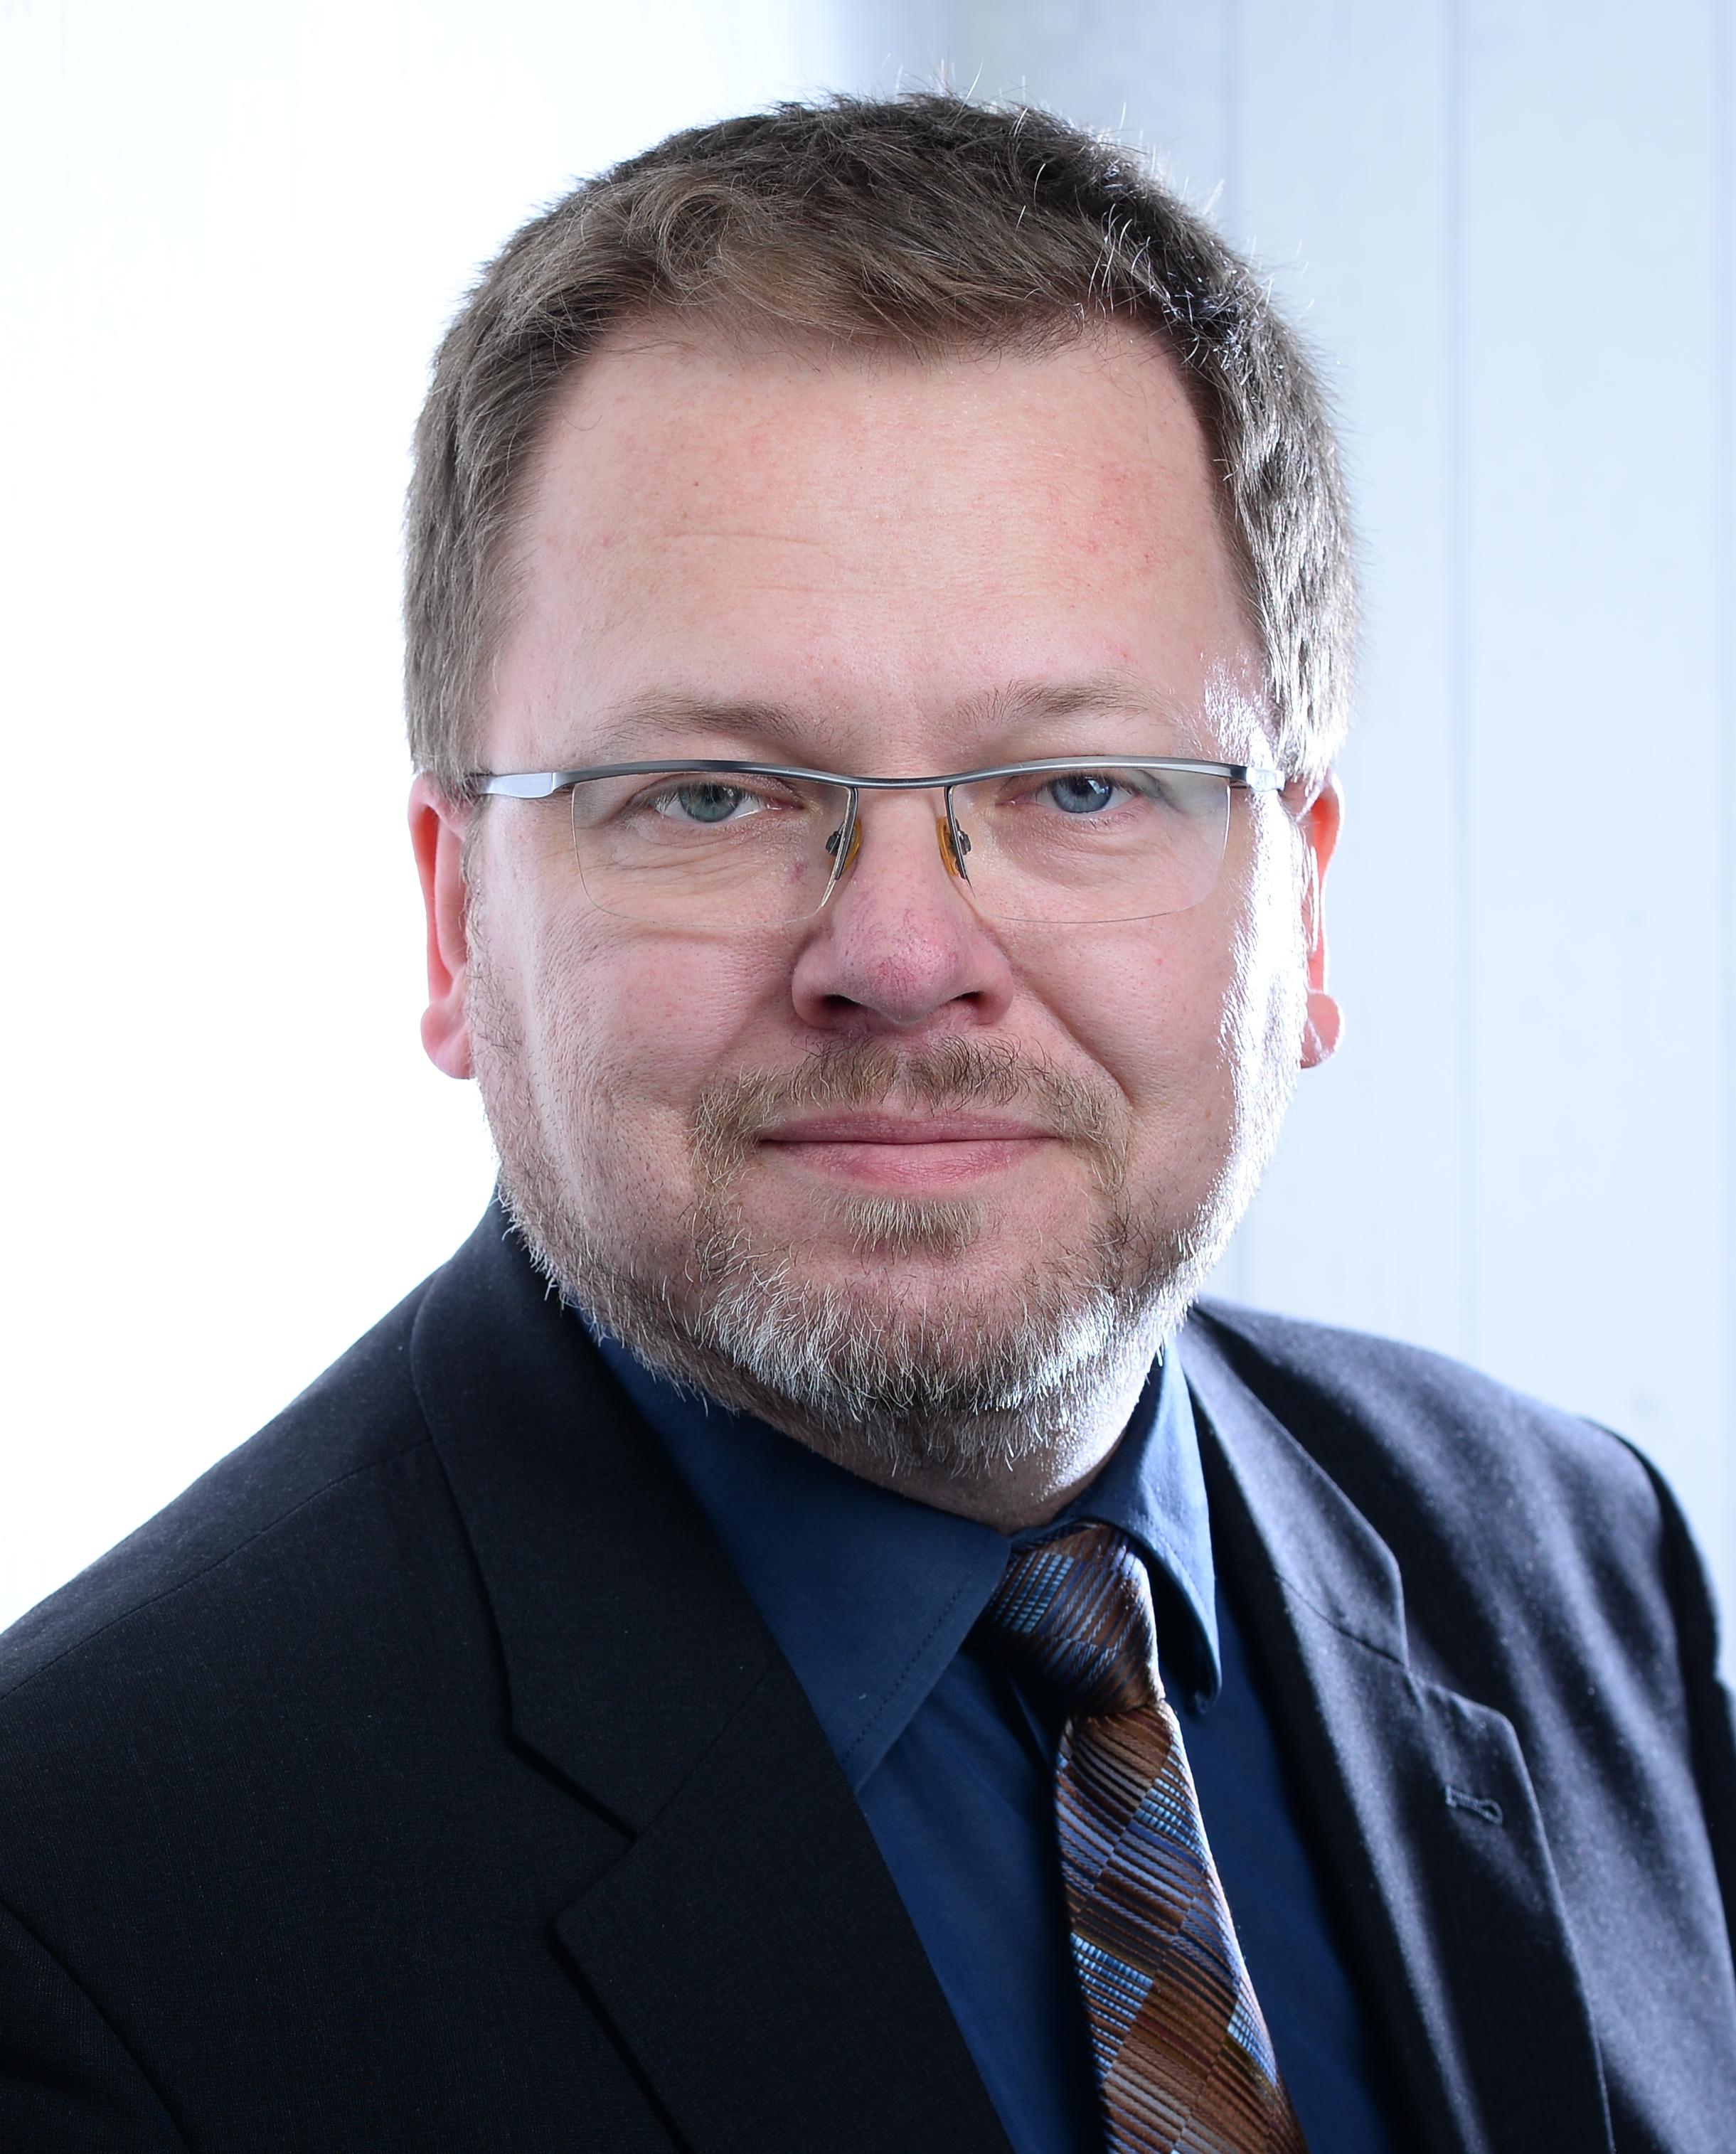 David Koeppe